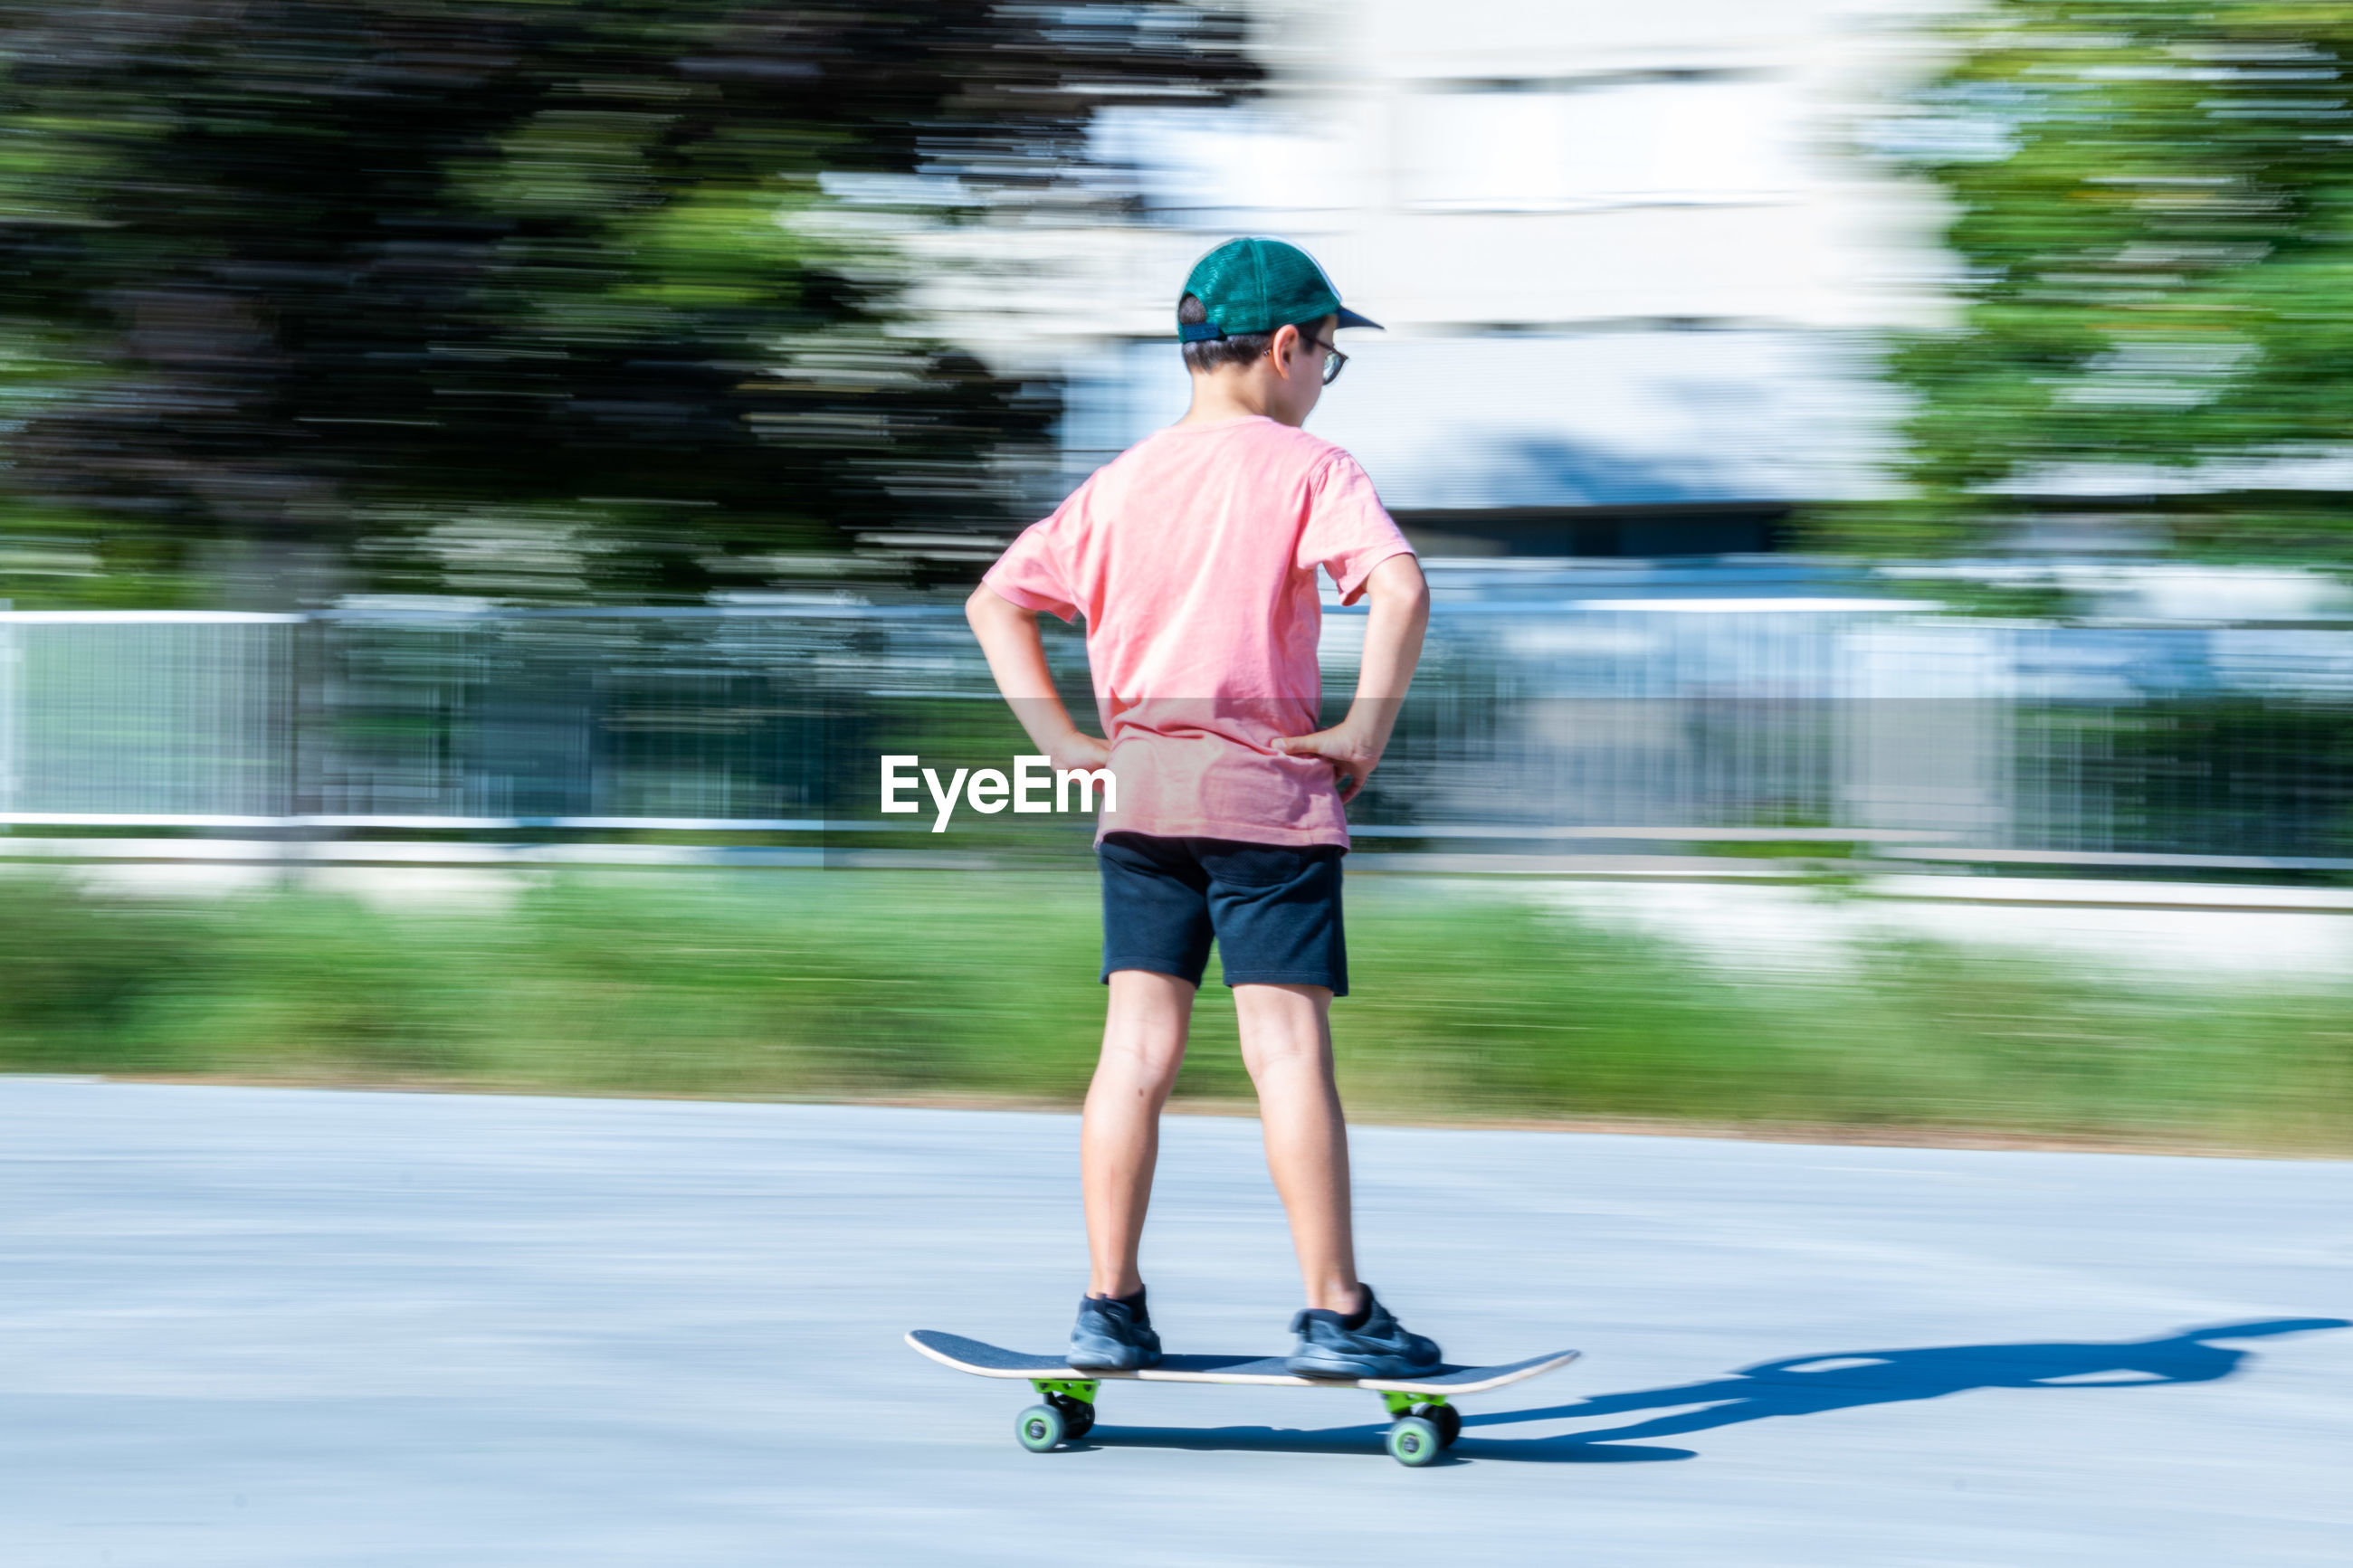 Full length rear view of boy skateboarding on road